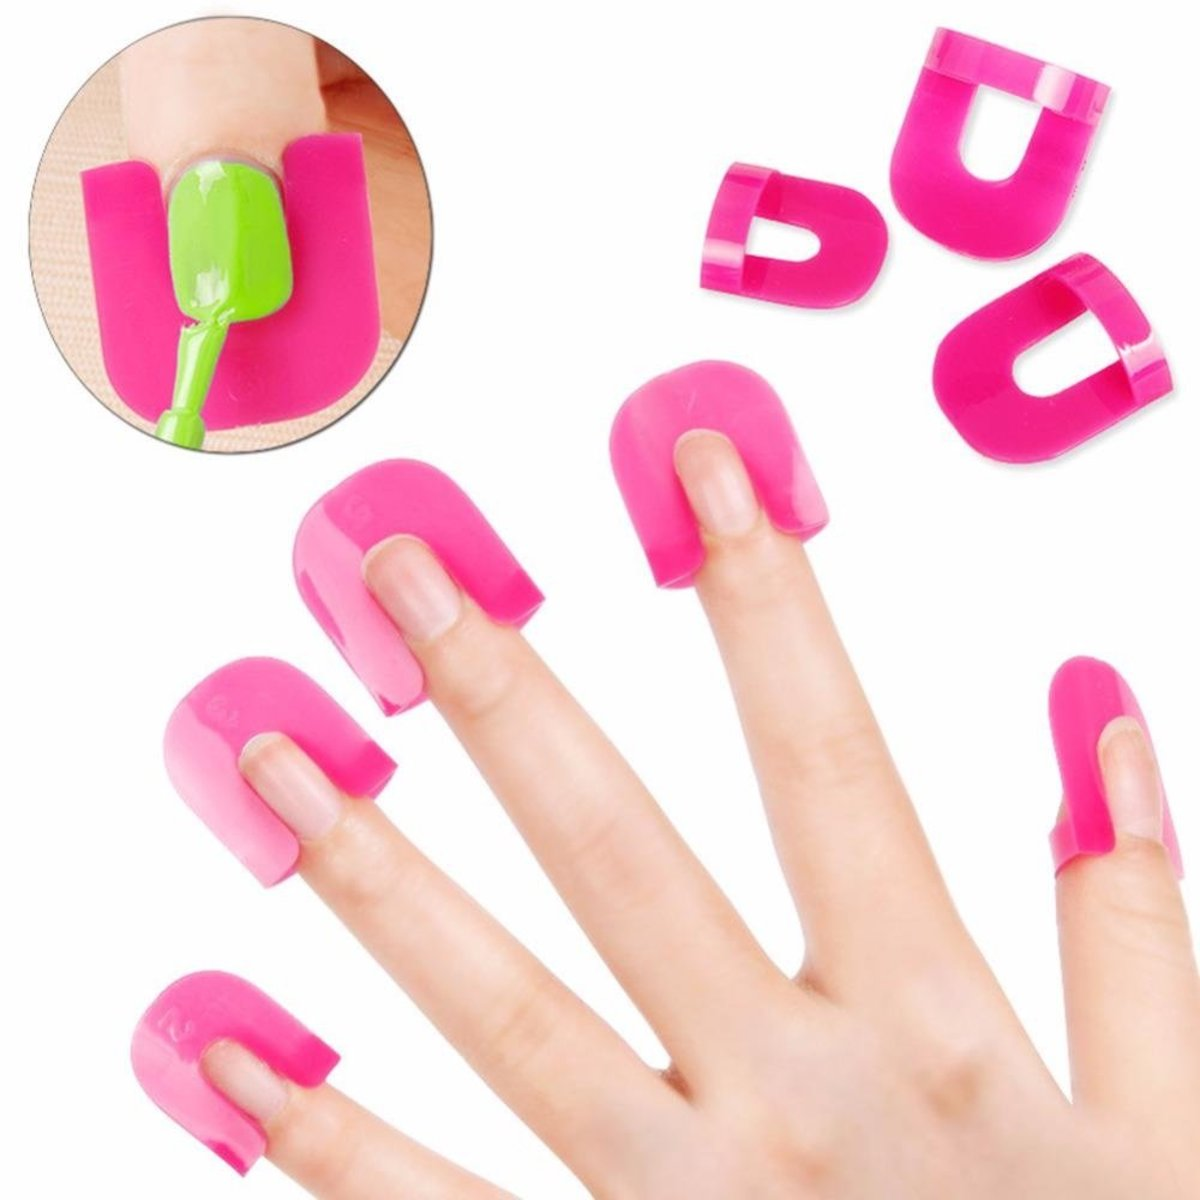 26Pcs/set Nail Polish Anti Overflow Clip Manicure Shield Protector Clamp Guard DIY Manicure Tool